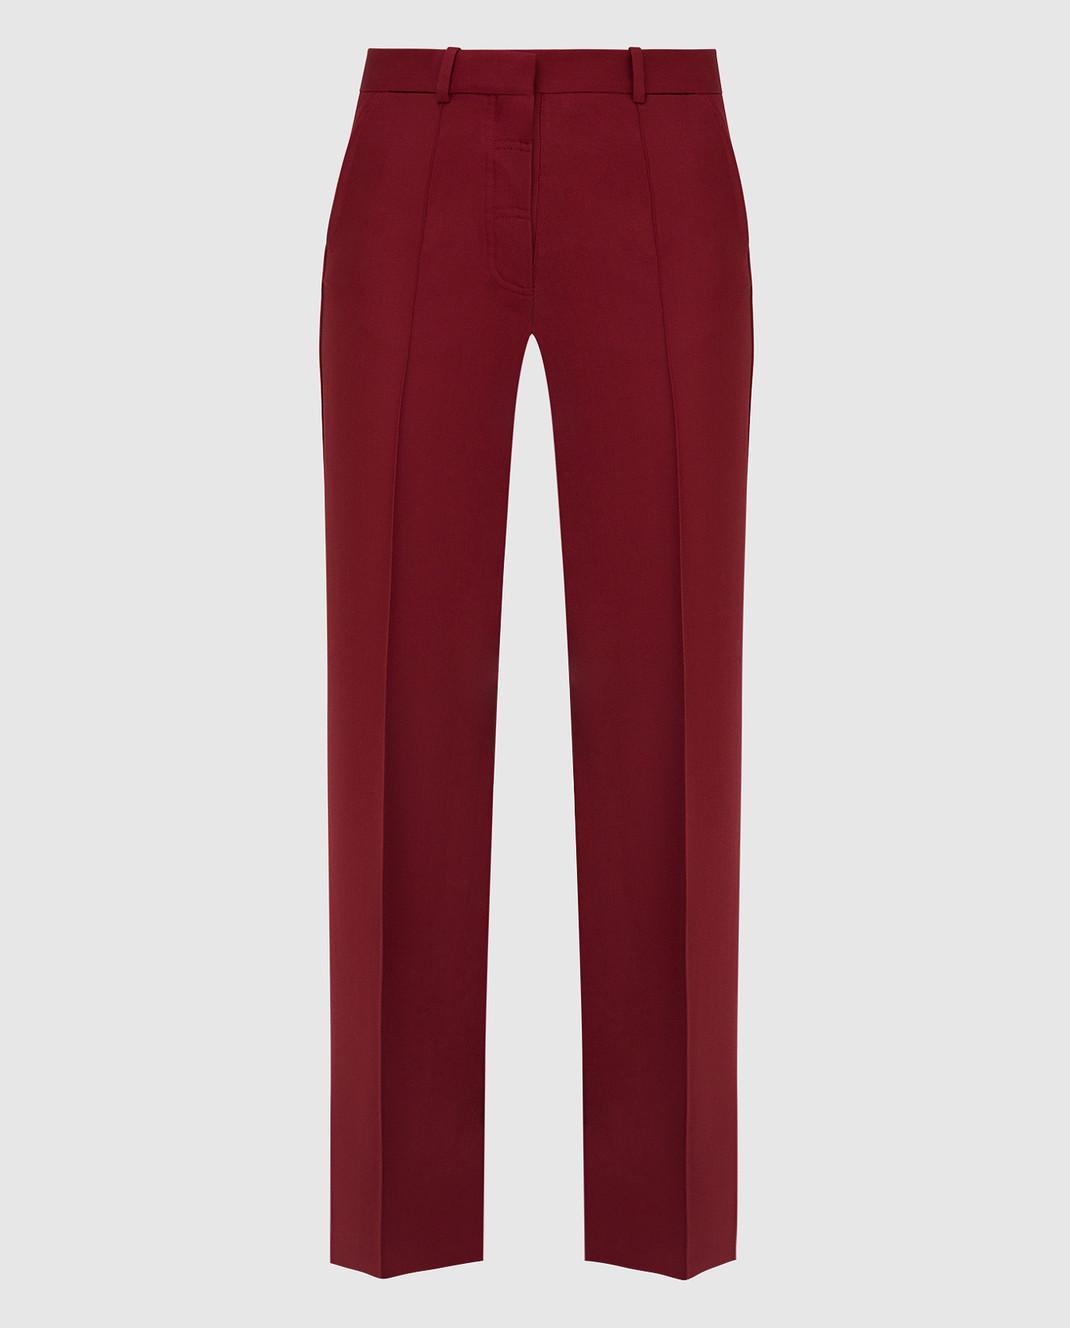 Victoria Beckham Бордовые брюки из шерсти TRWID2500D